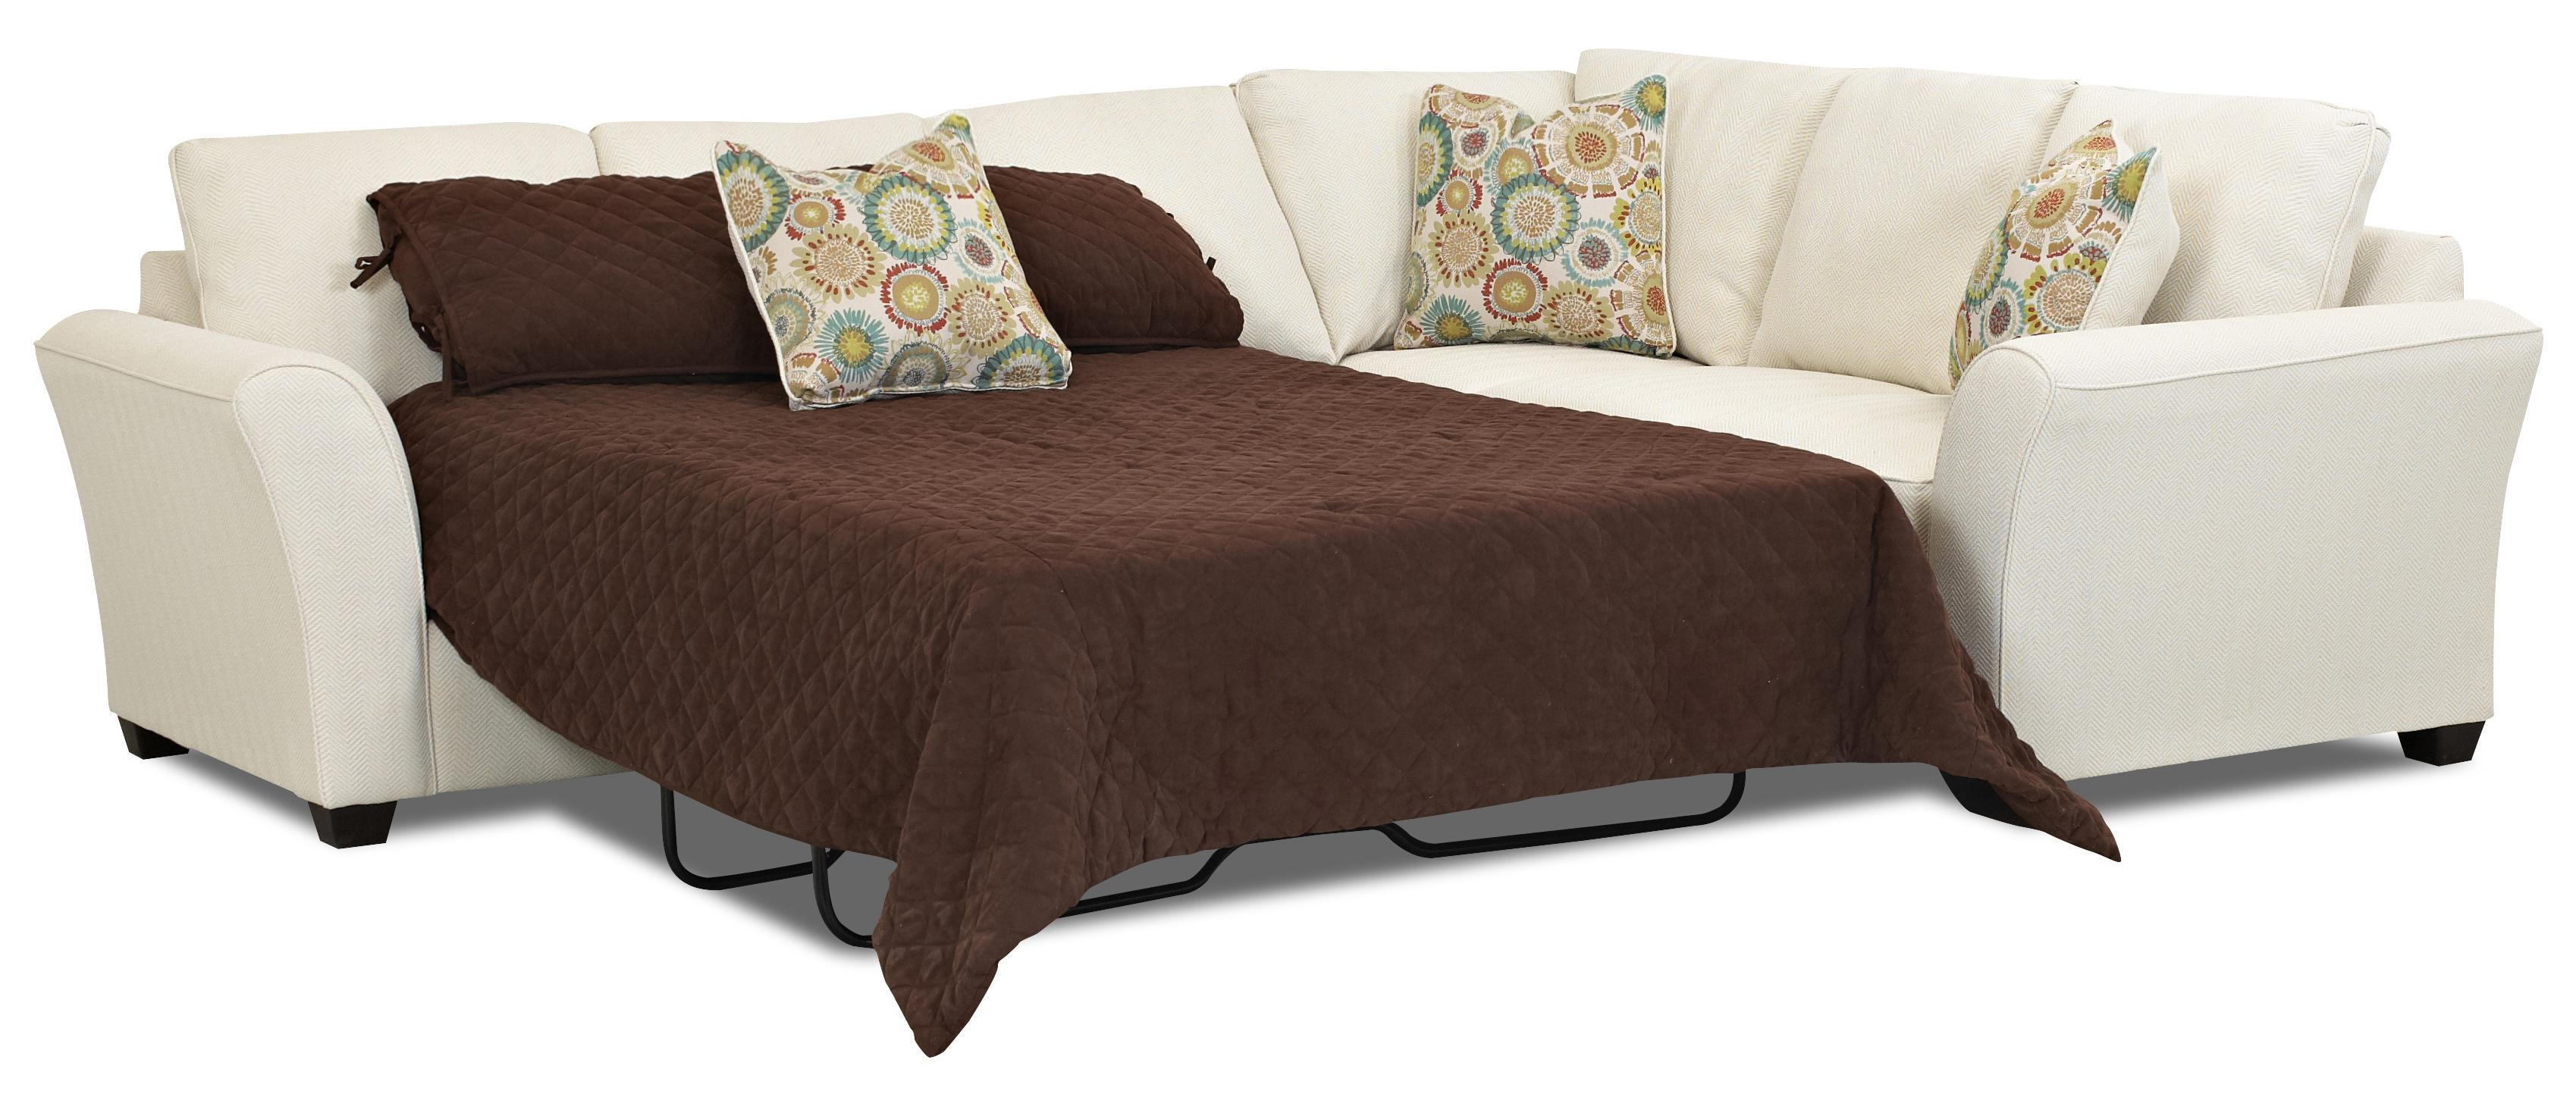 transitional sectional sofa. Black Bedroom Furniture Sets. Home Design Ideas